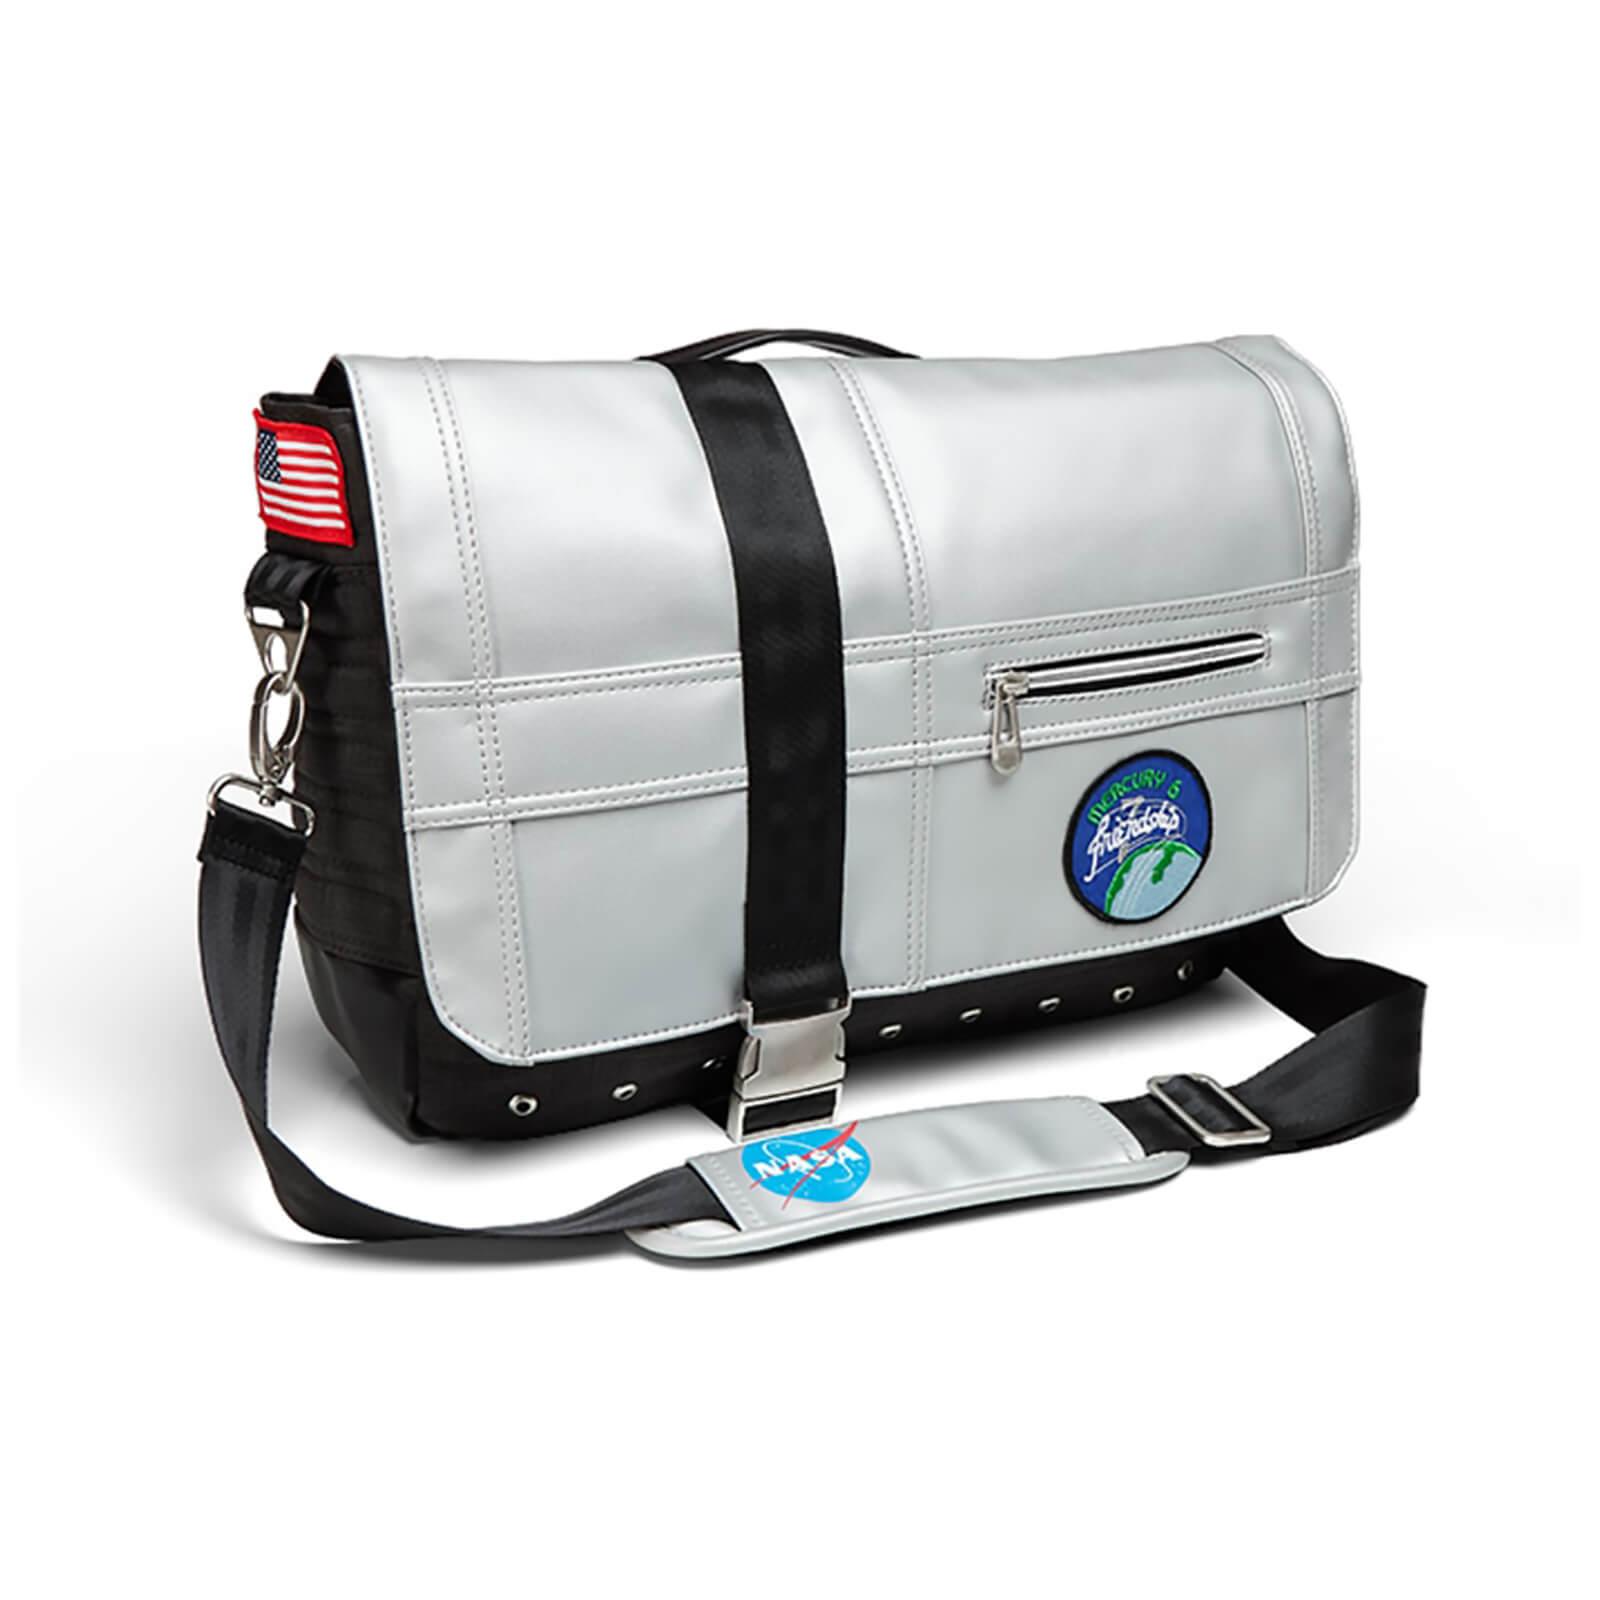 Coop NASA Mercury 6 Messenger Bag